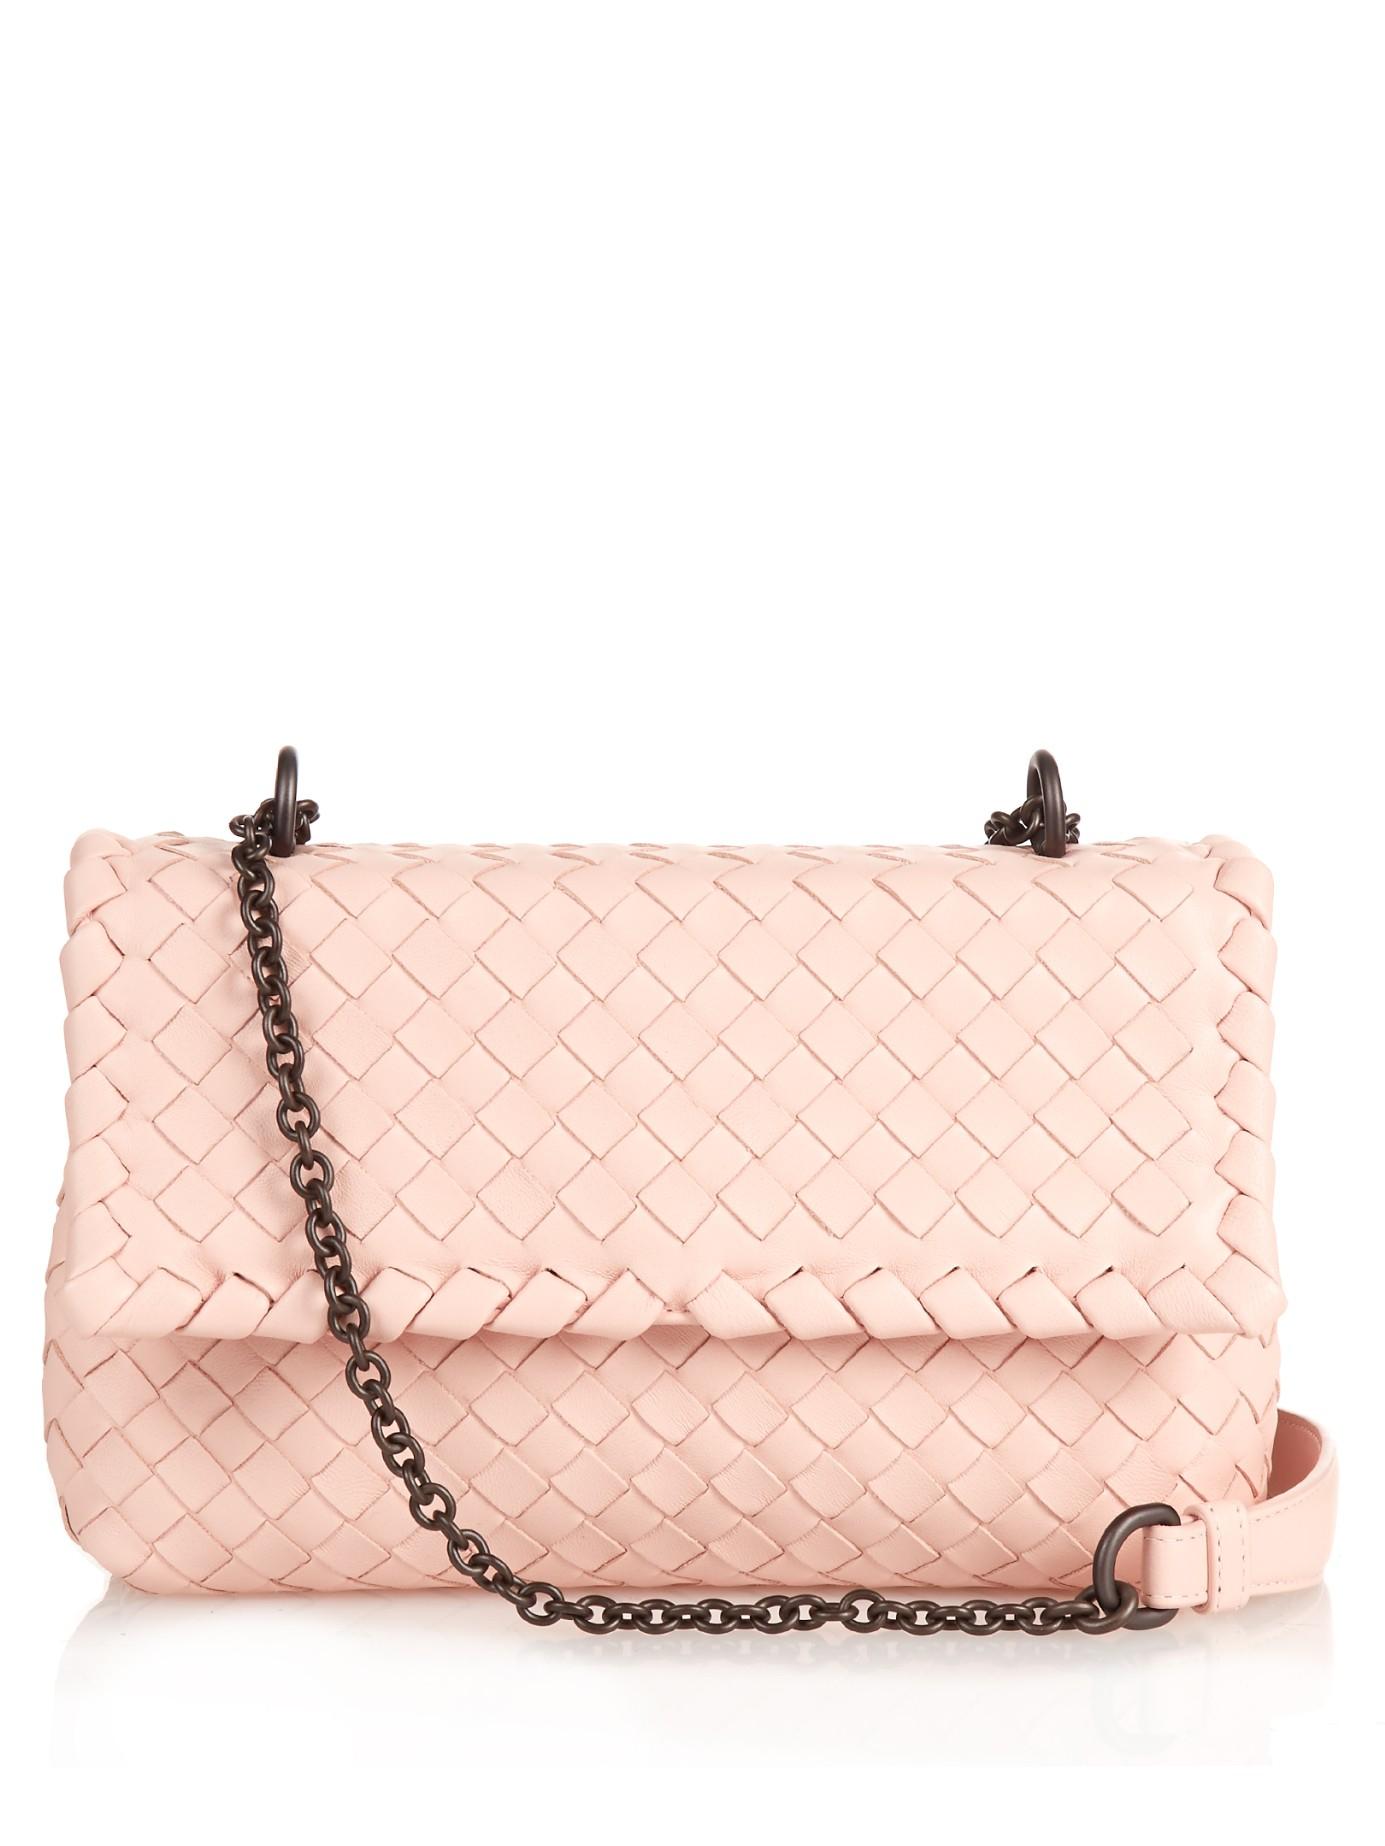 d0a5eb681e3c Bottega Veneta Baby Olimpia Intrecciato Leather Shoulder Bag in Pink ...